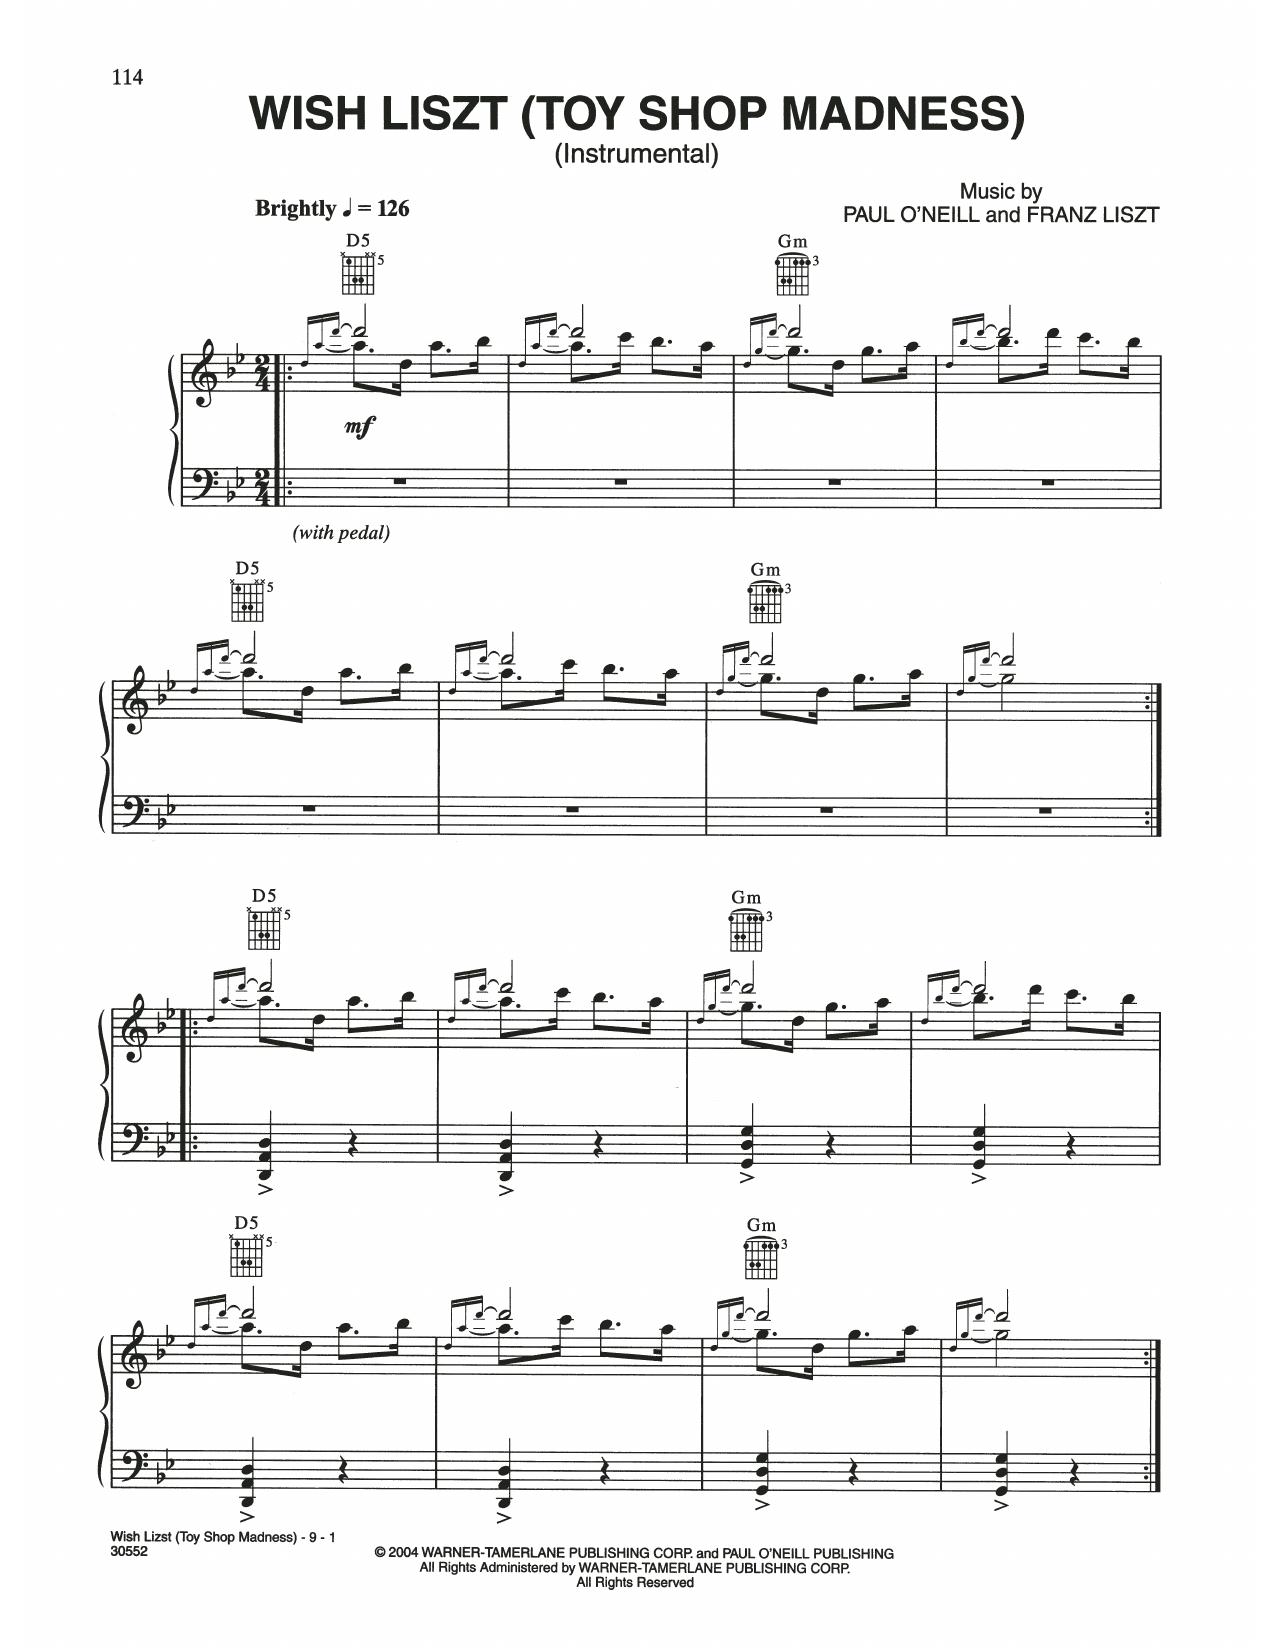 Wish Liszt (Toy Shop Madness) (Piano Solo)